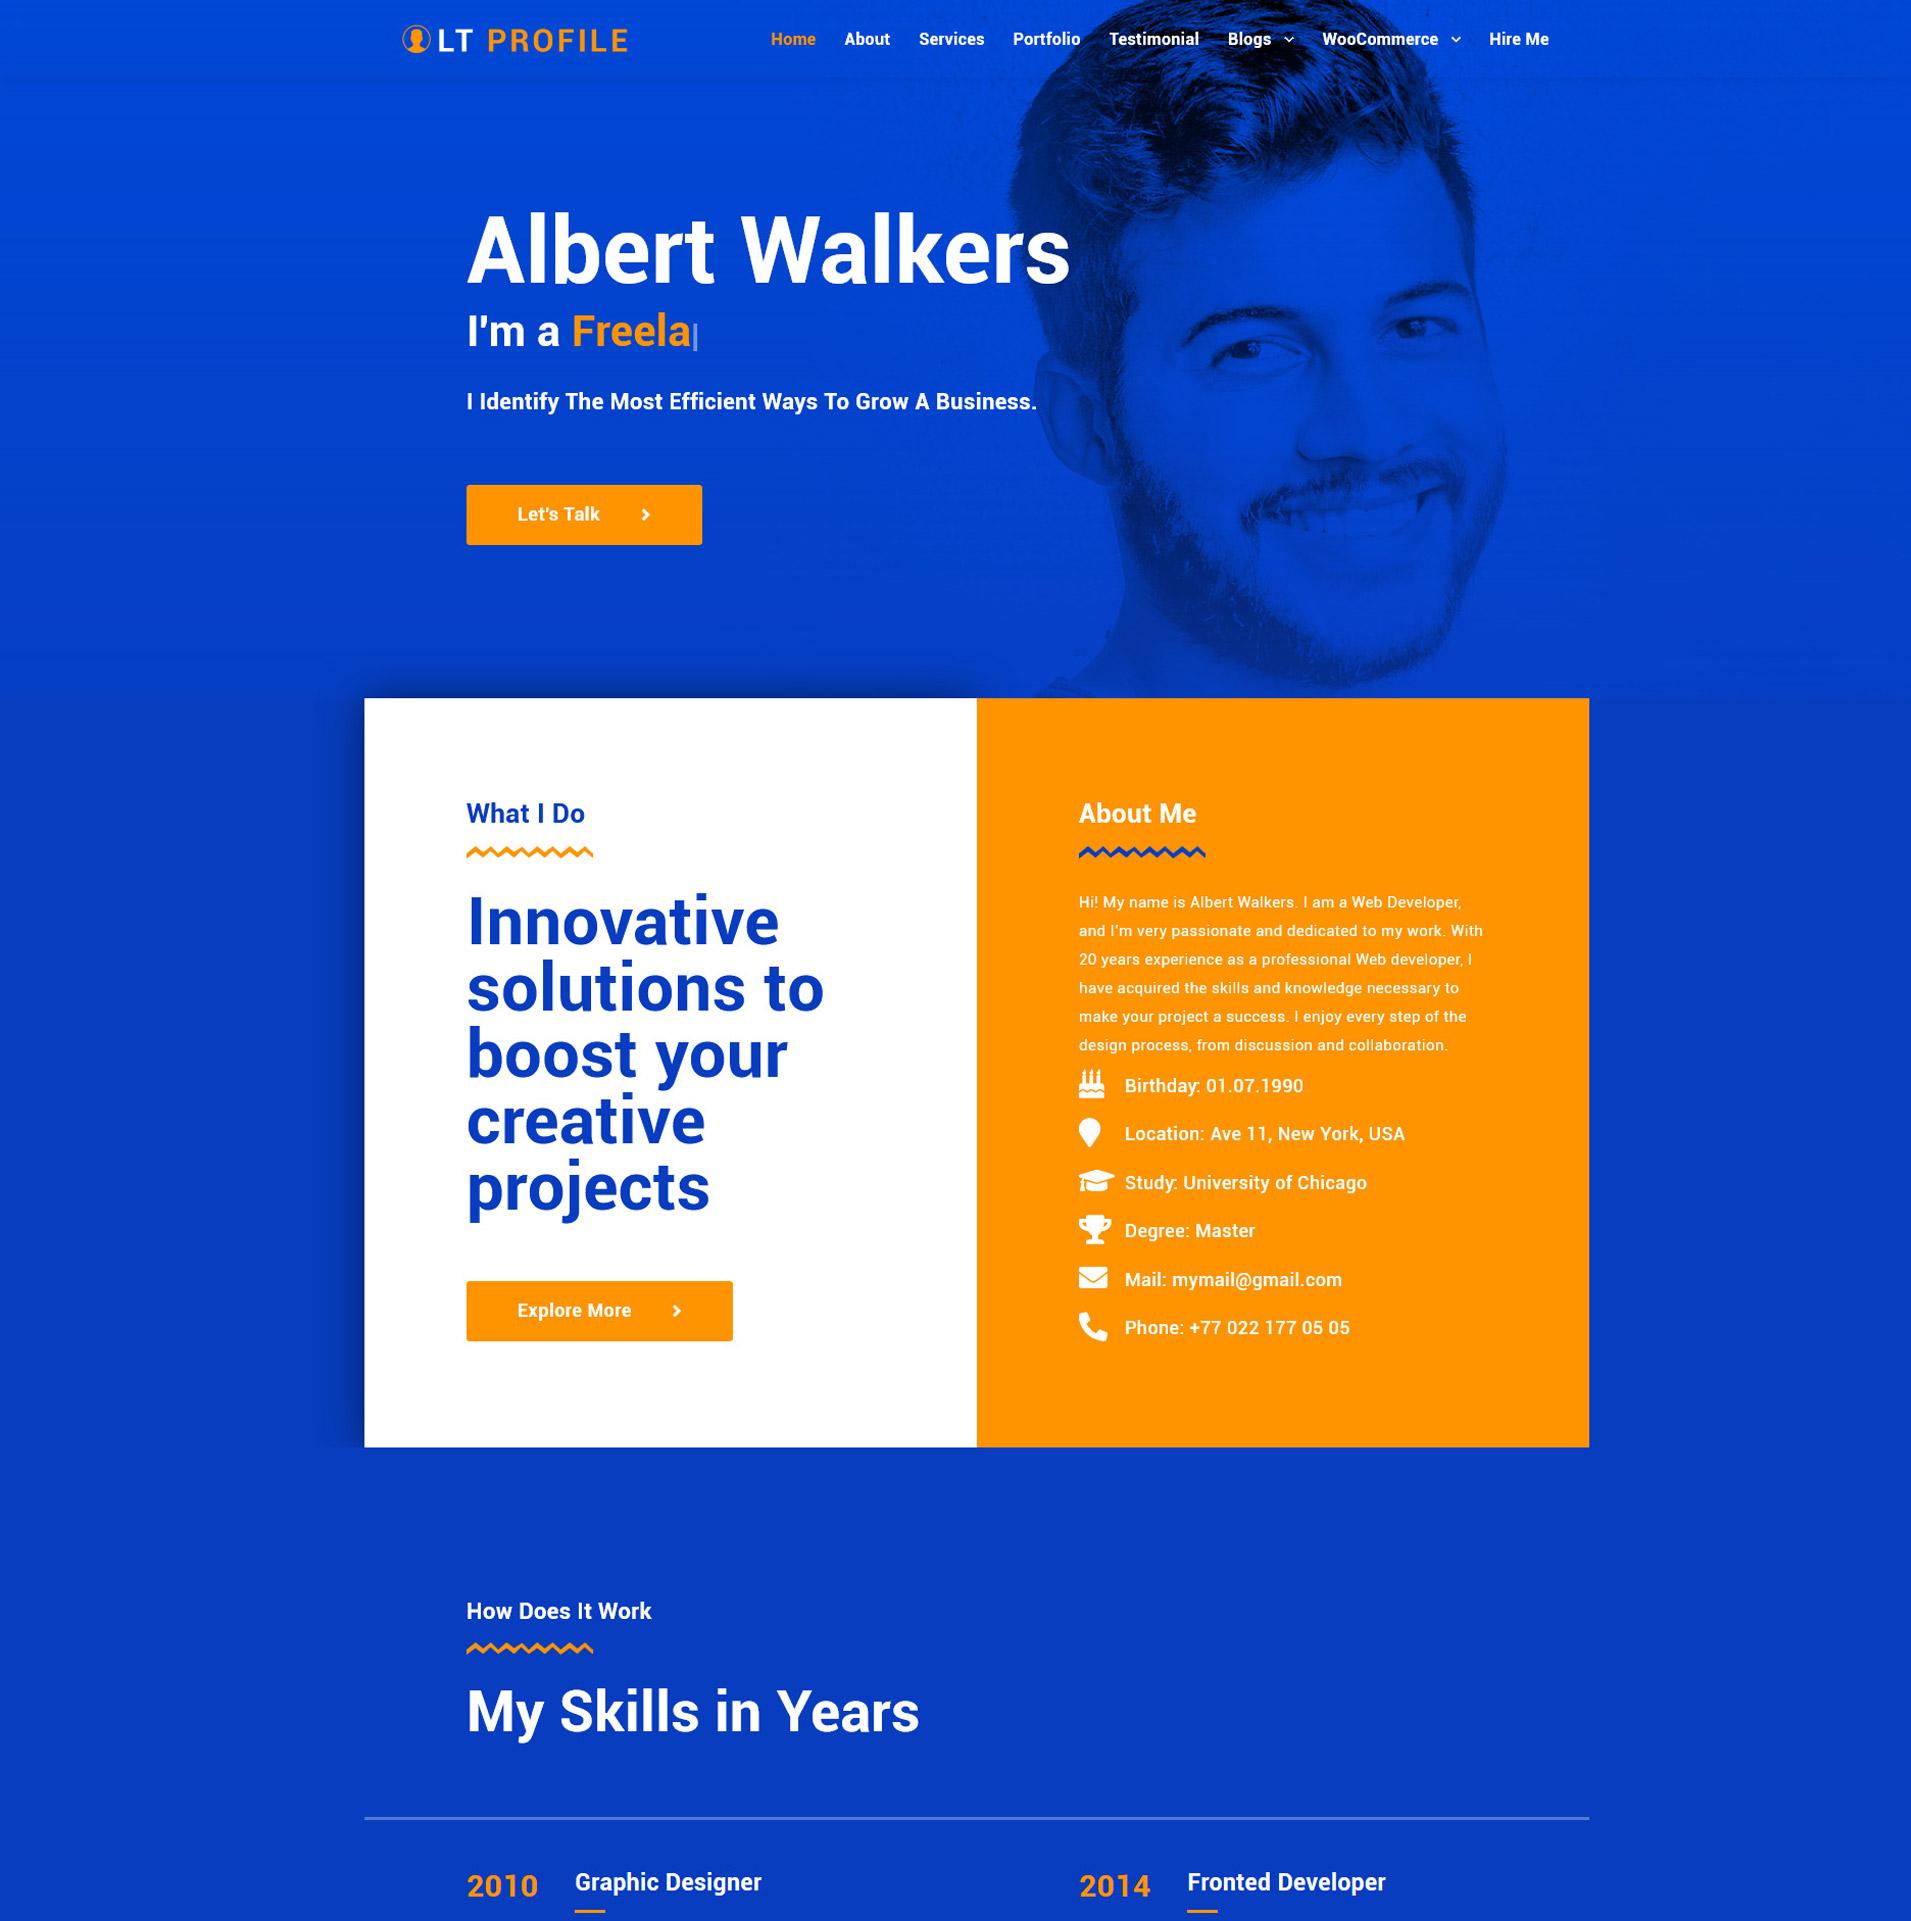 lt-profile-fullscreen